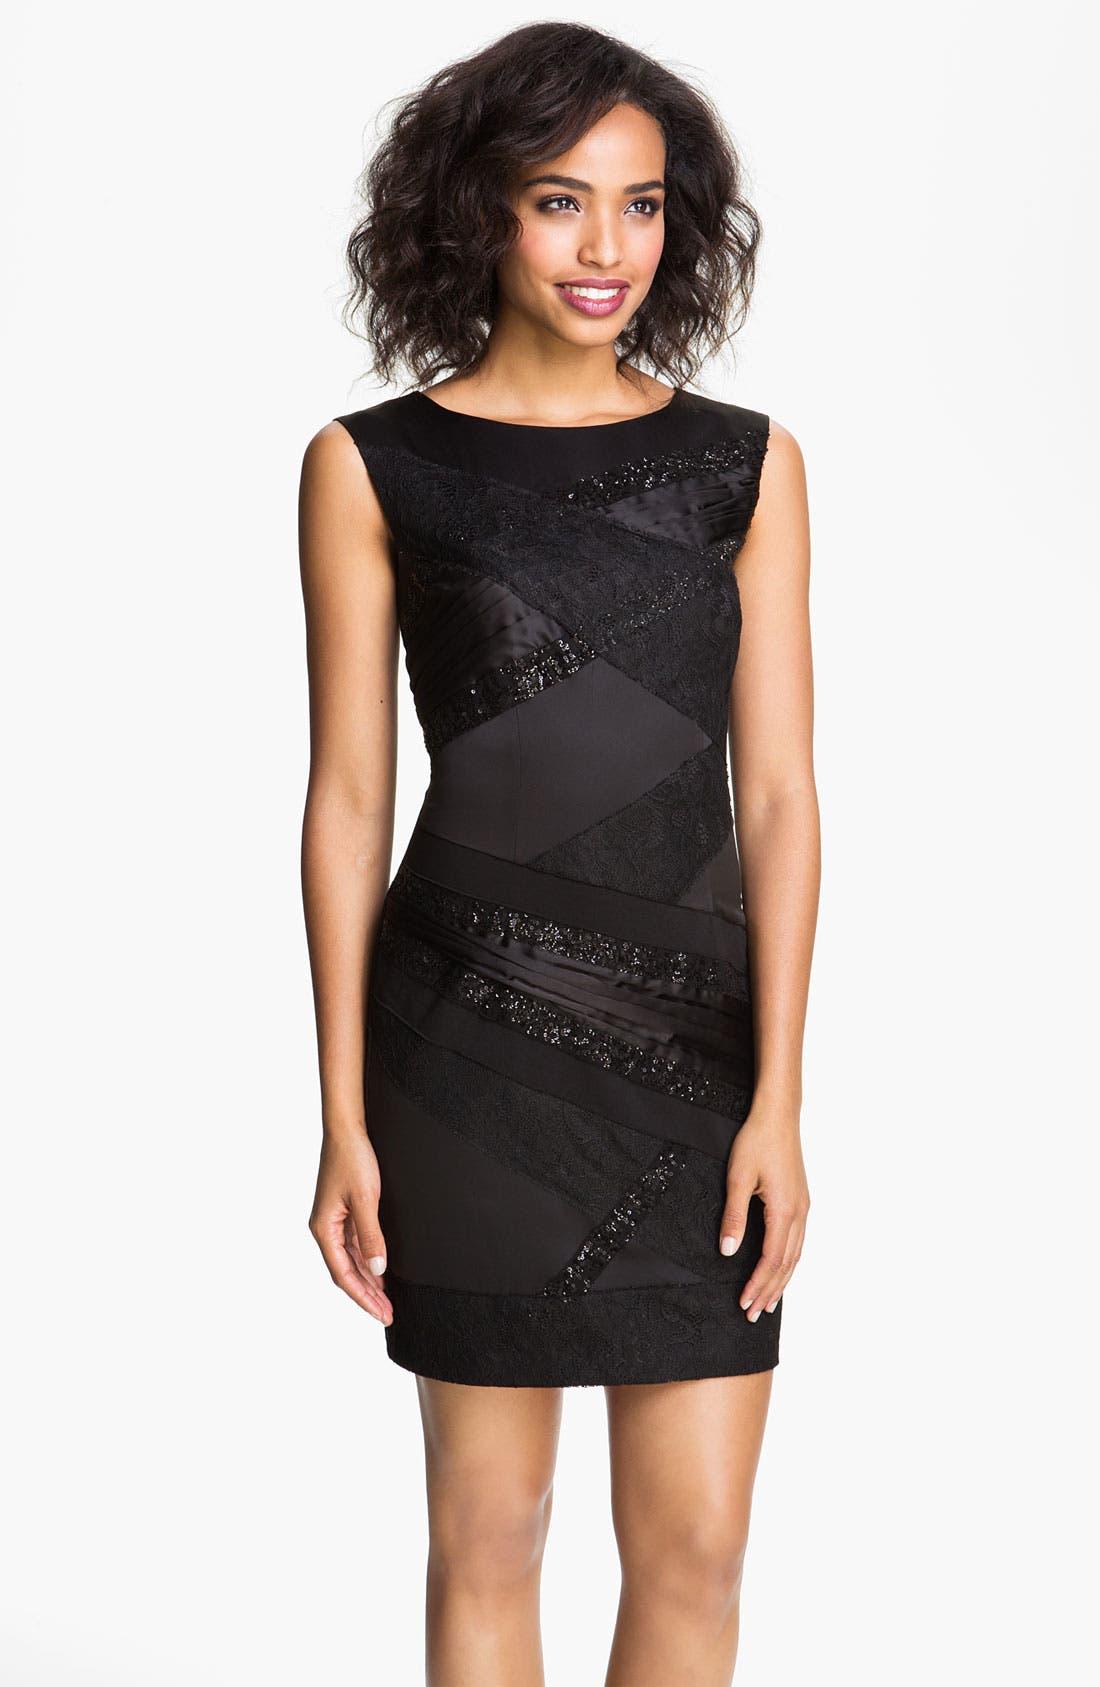 Alternate Image 1 Selected - Jessica Simpson Back Cutout Mixed Media Sheath Dress